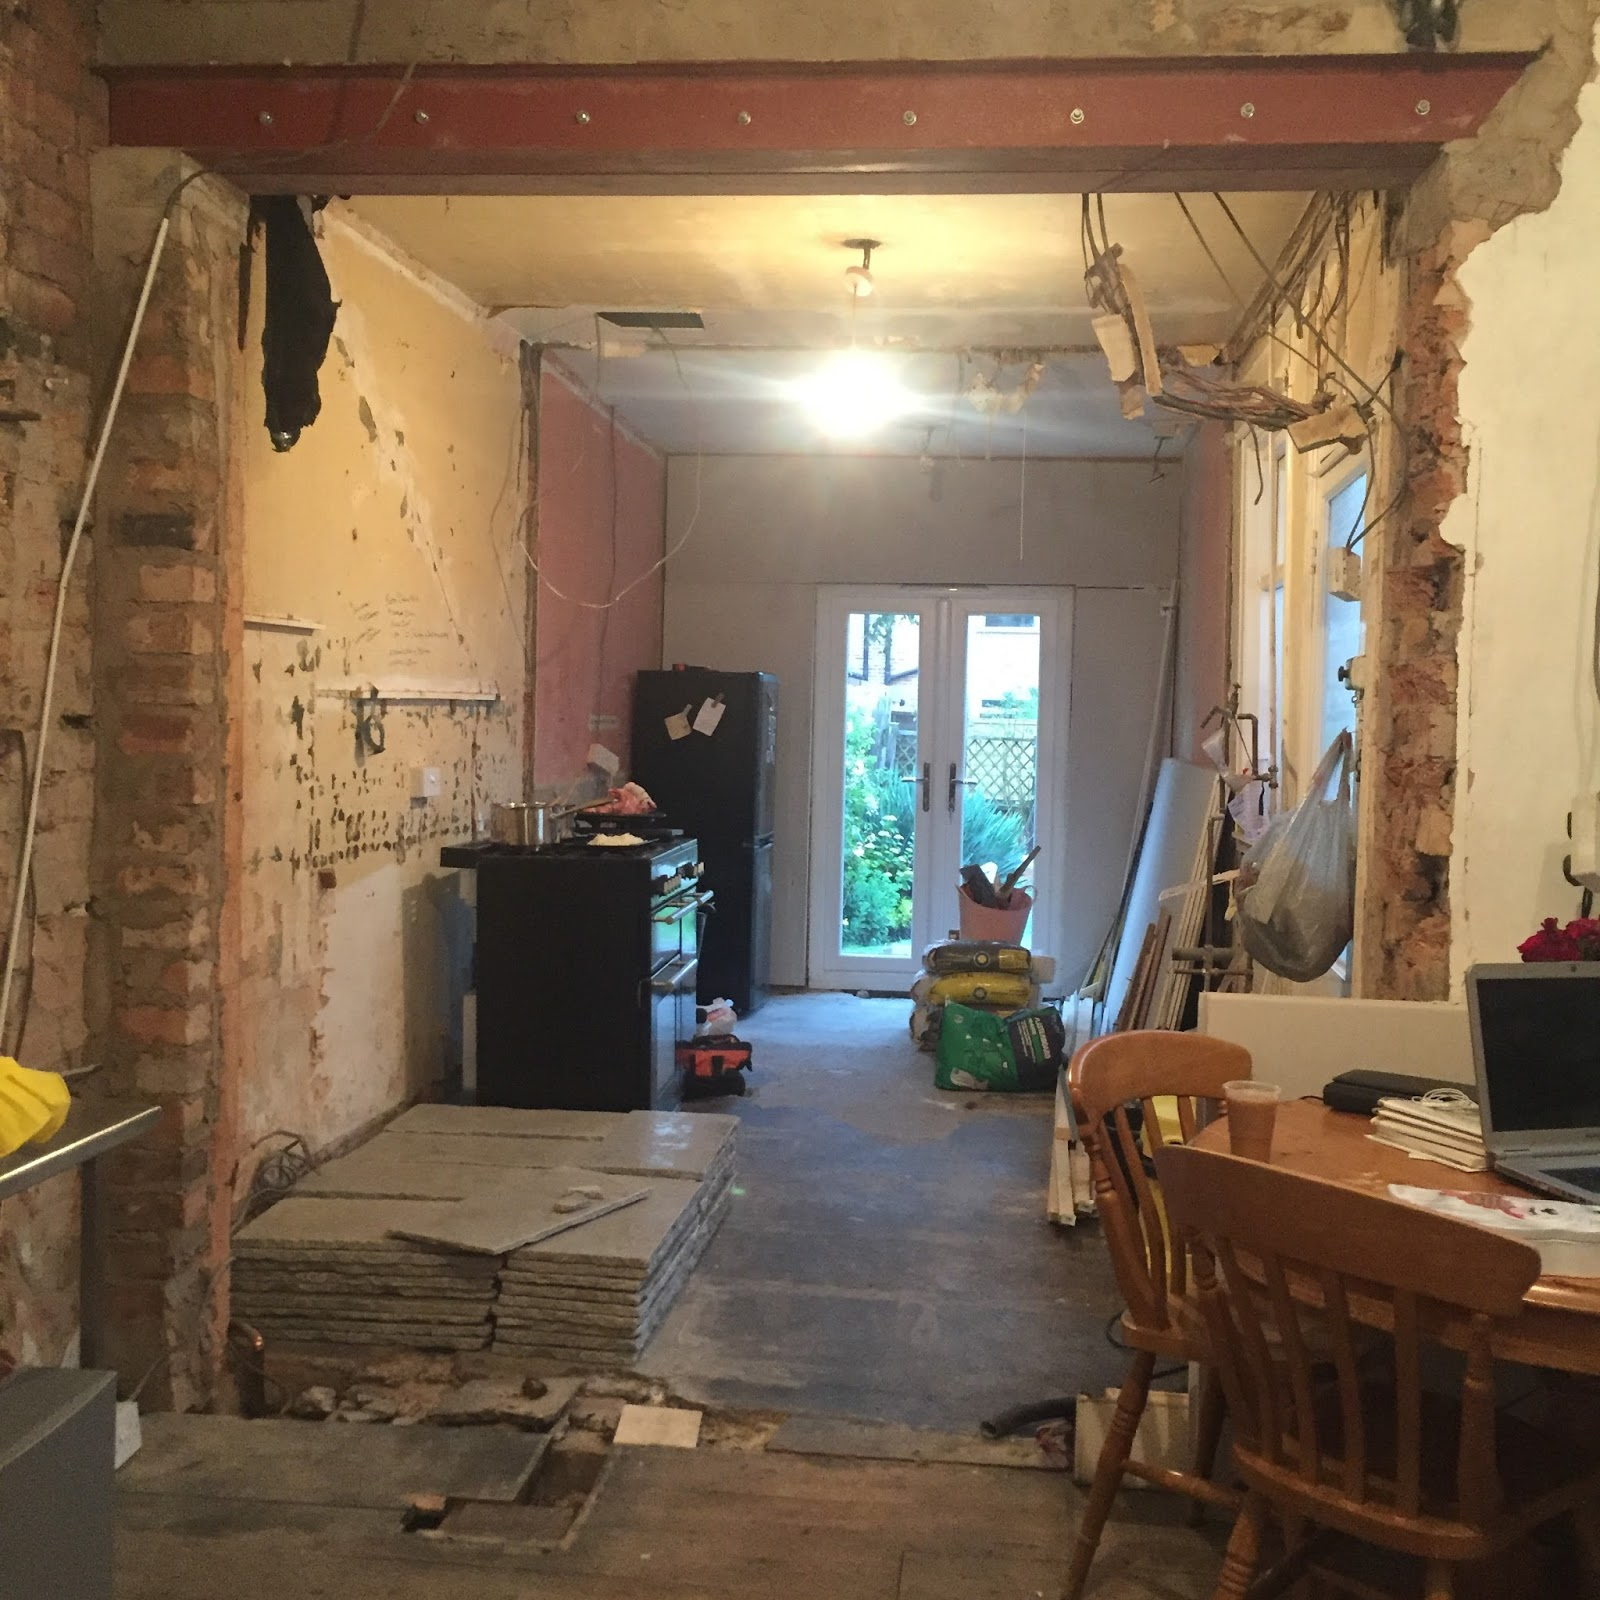 UK Home Renovation, Interiors And DIY Blog